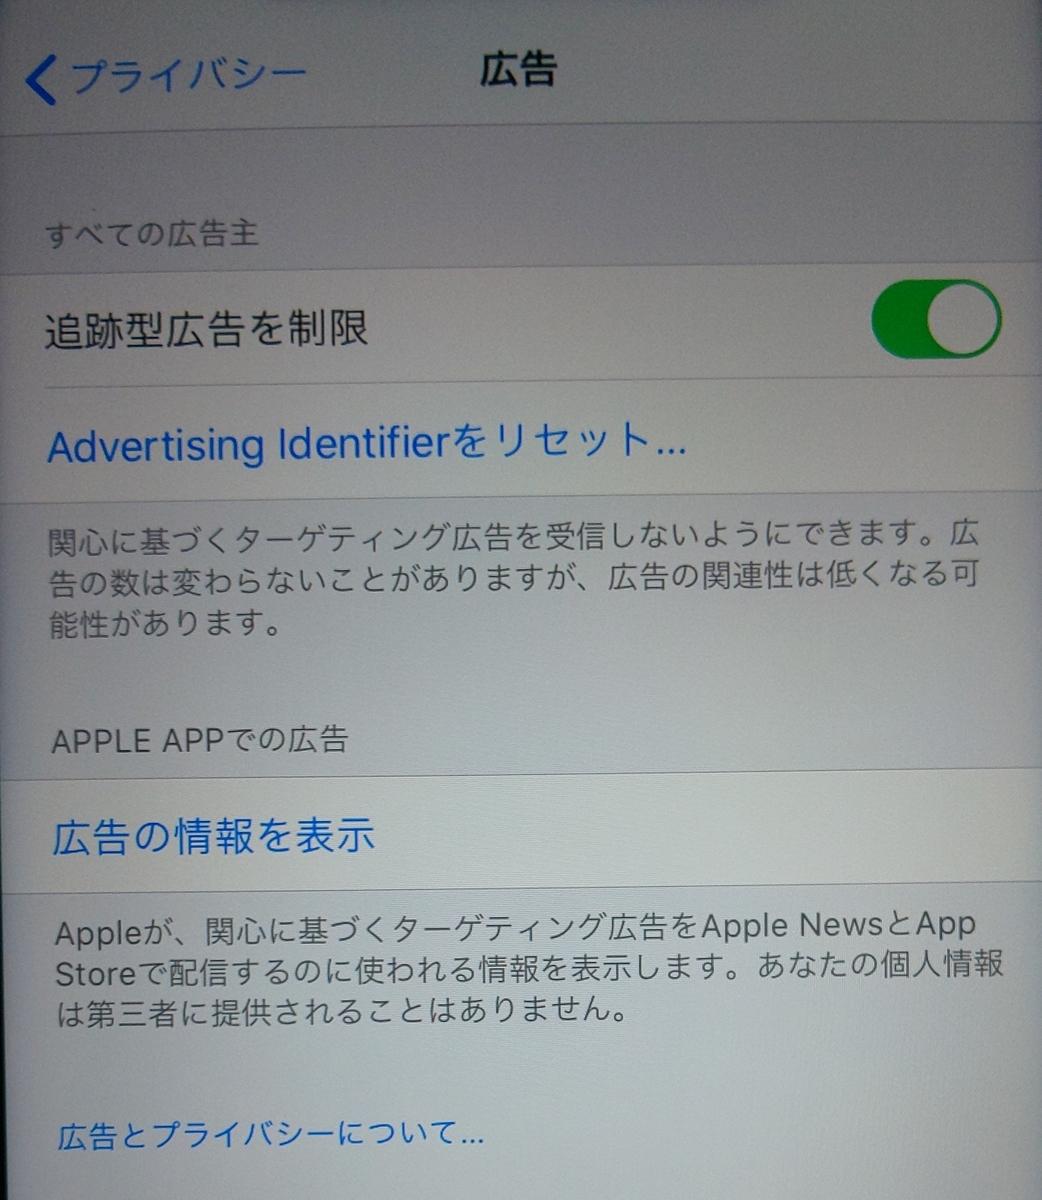 iOS14ではIDFAがデフォルトでオプトアウト